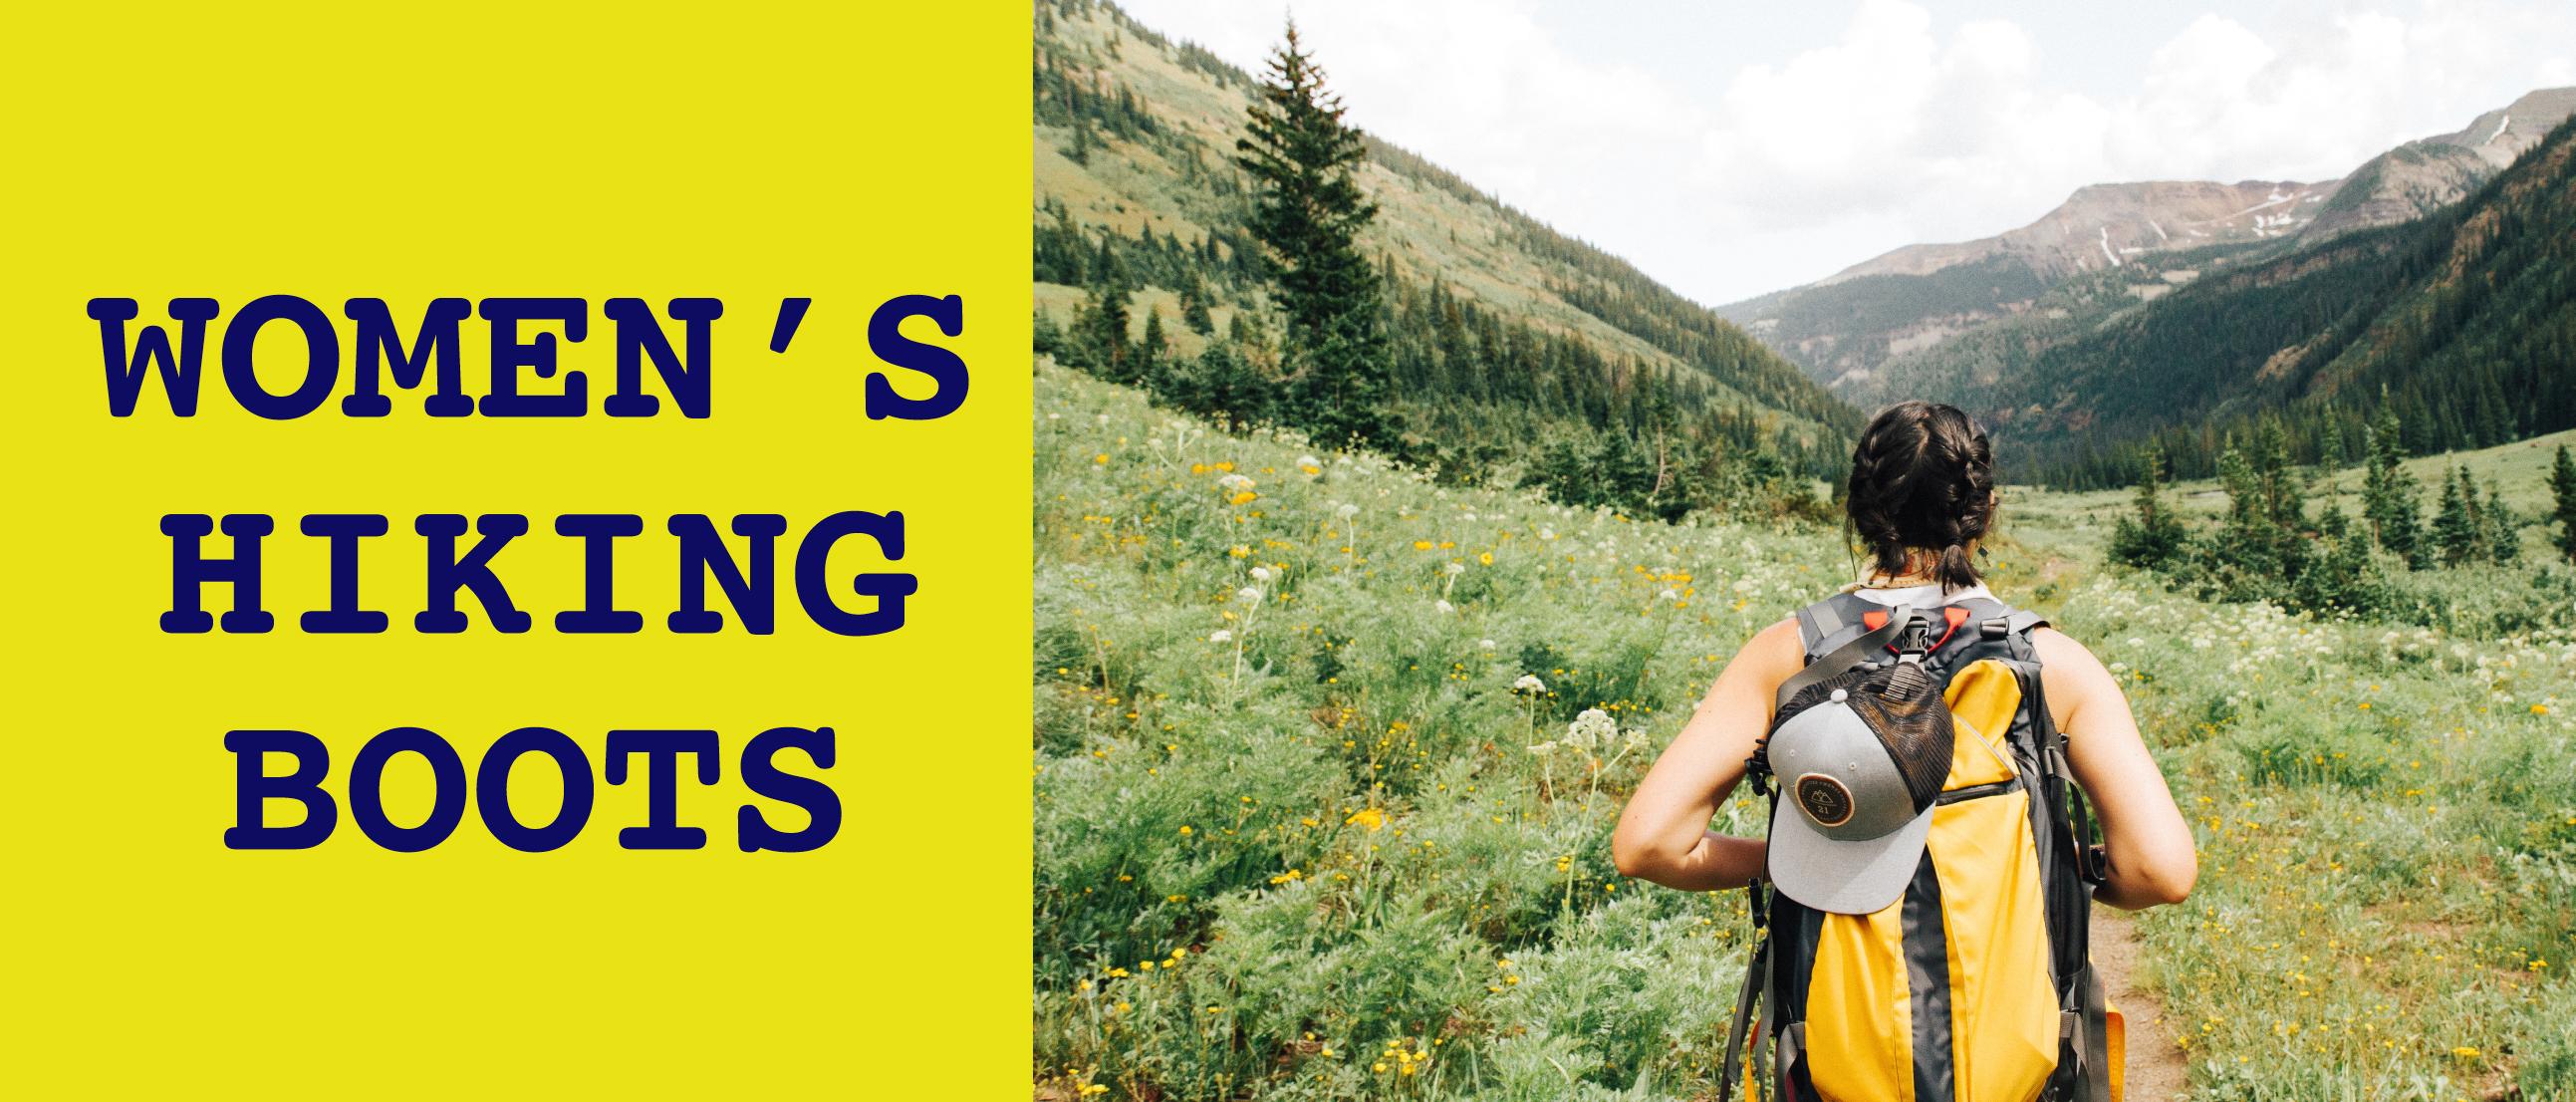 1.-womens-hiking-boots.jpg